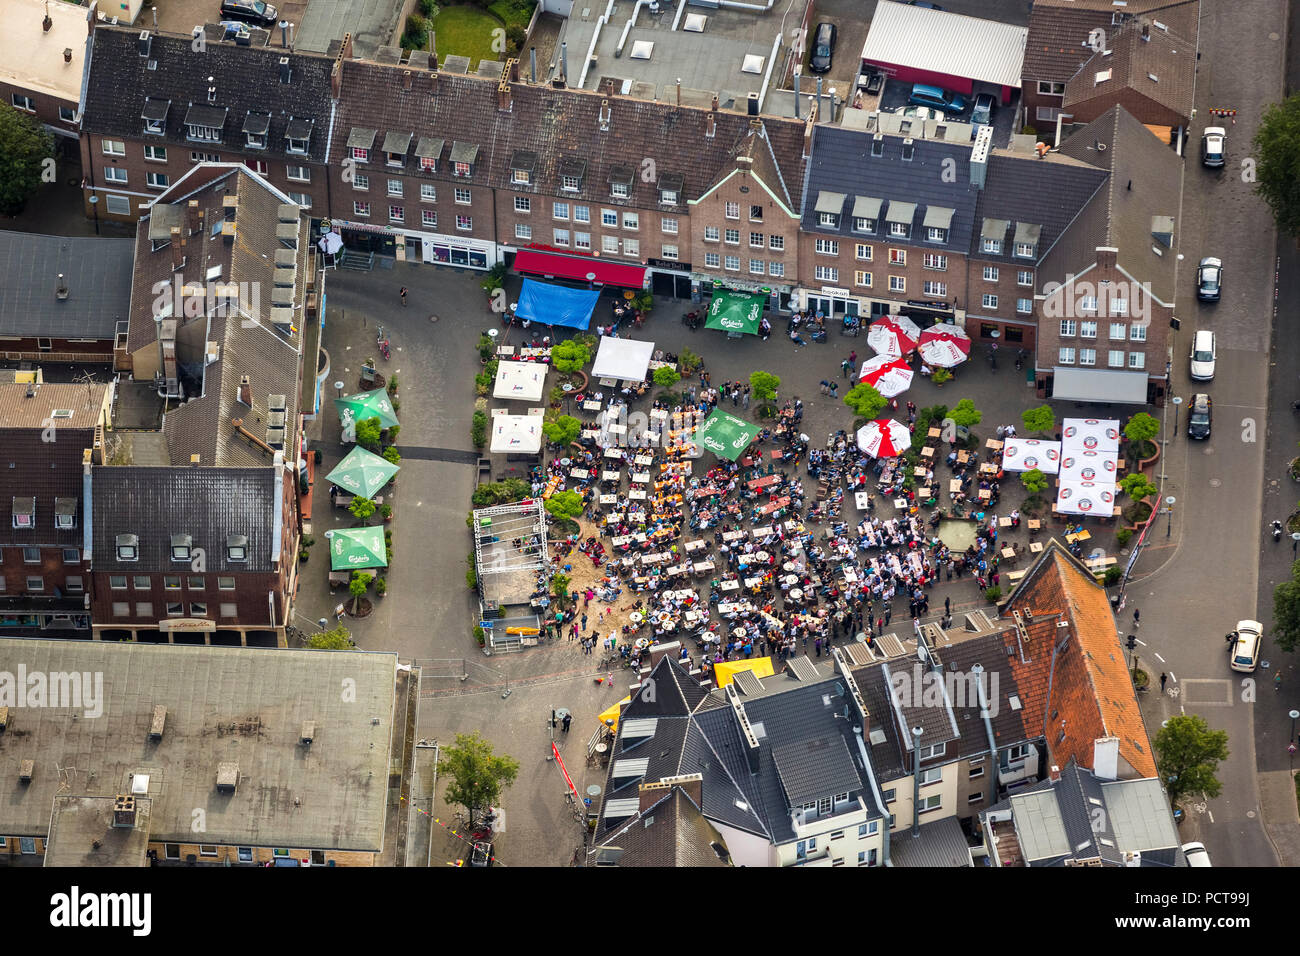 Football World Cup 2014, aerial photo, public screening on Kornmarkt square at Wesel, Wesel, Lower Rhine, North Rhine-Westphalia, Germany - Stock Image